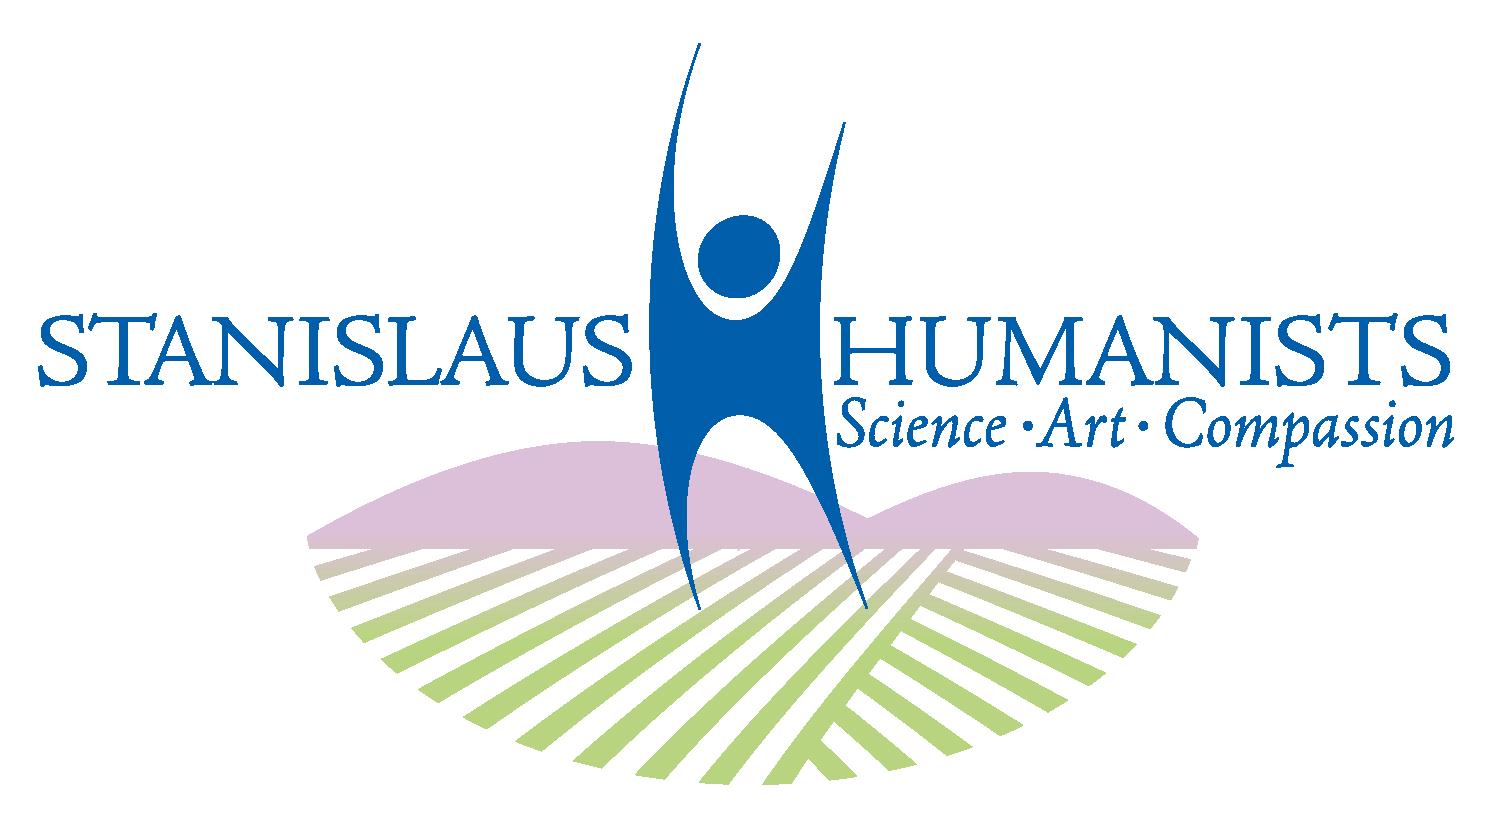 Stanislaus Humanists